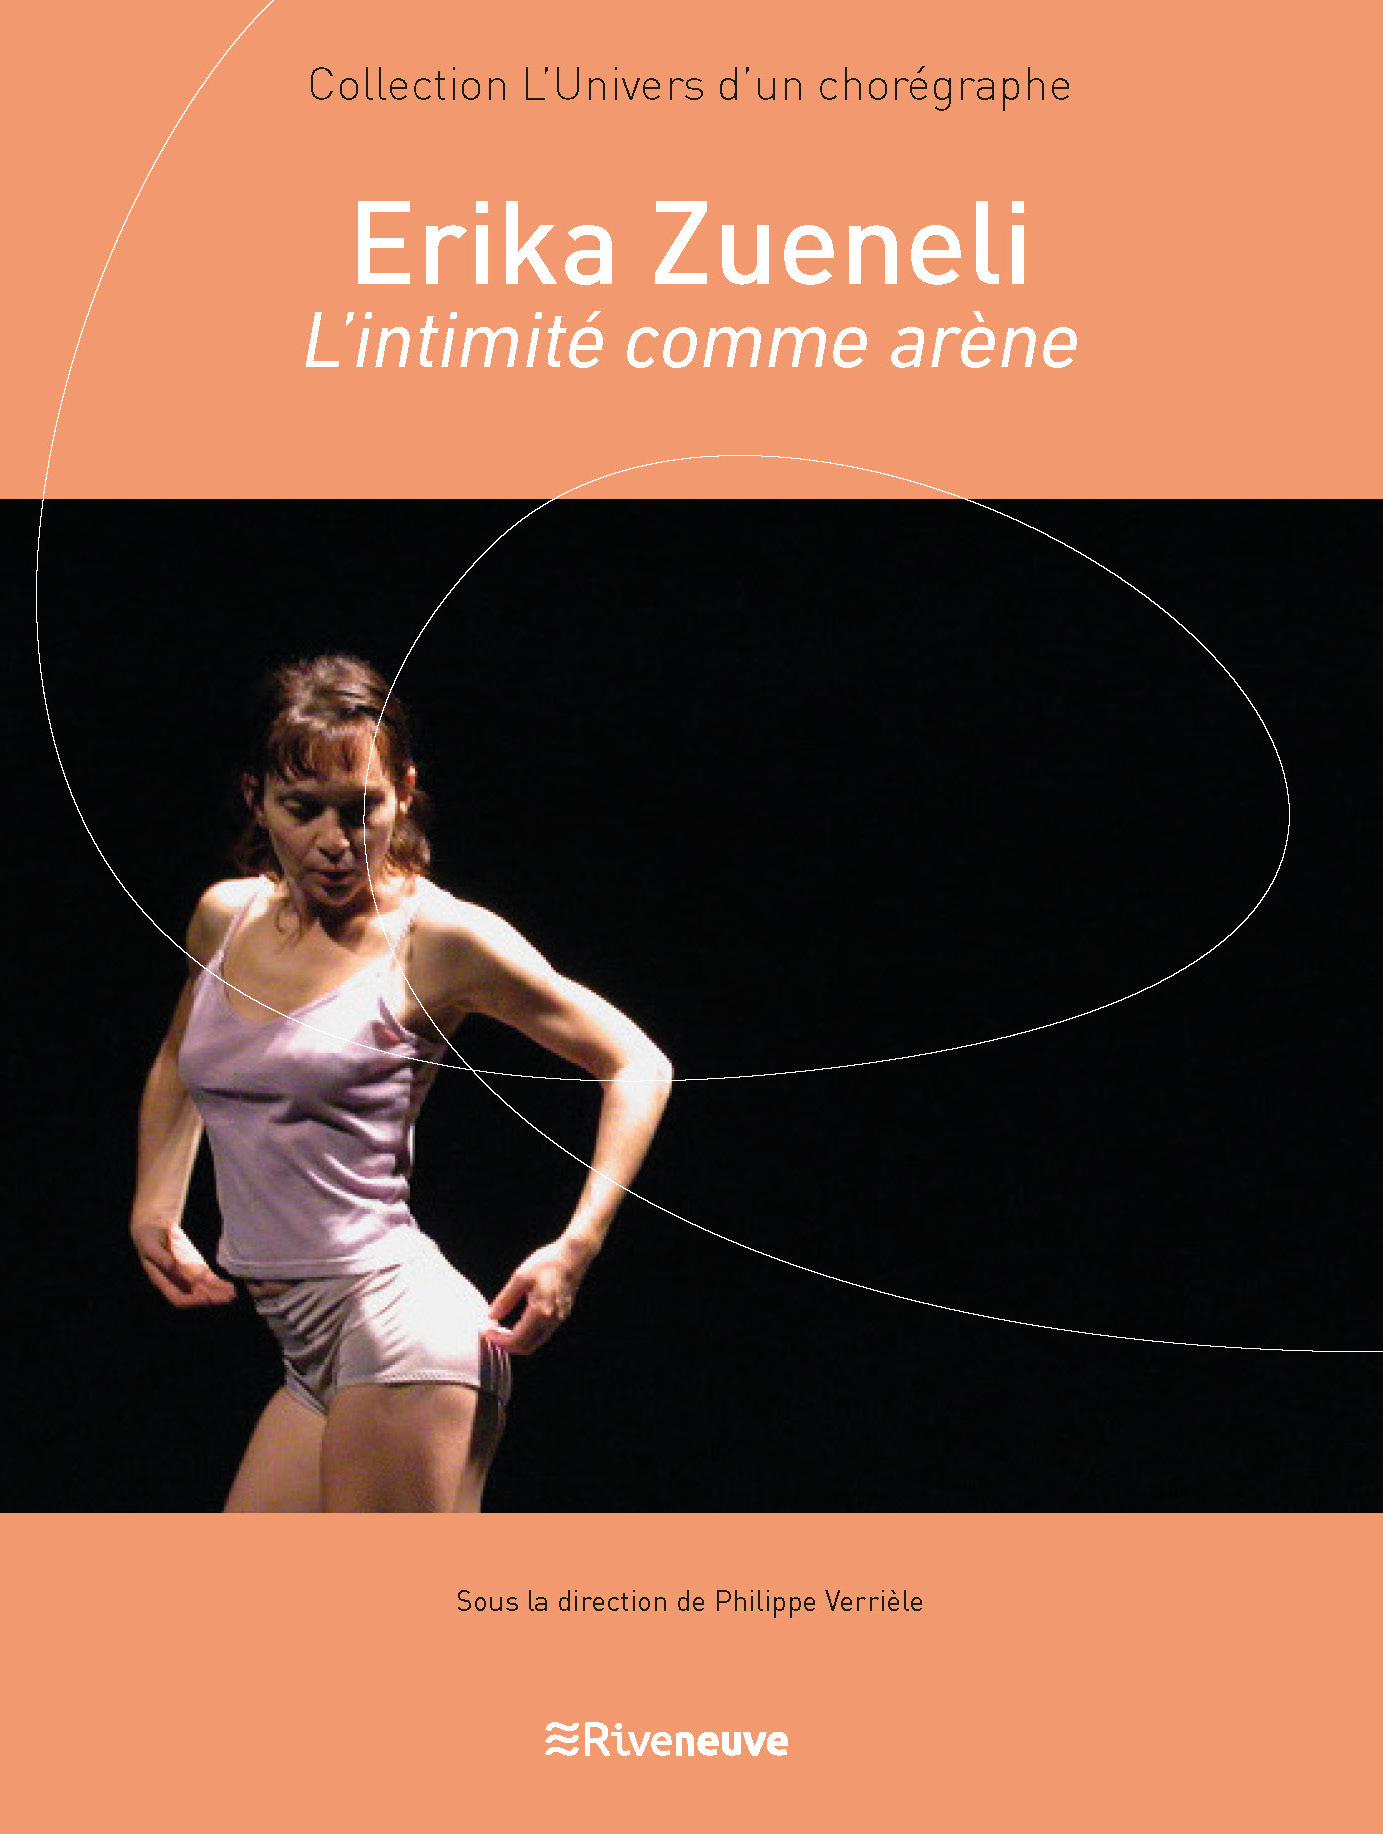 Erika Zueneli. L'intimité comme arène